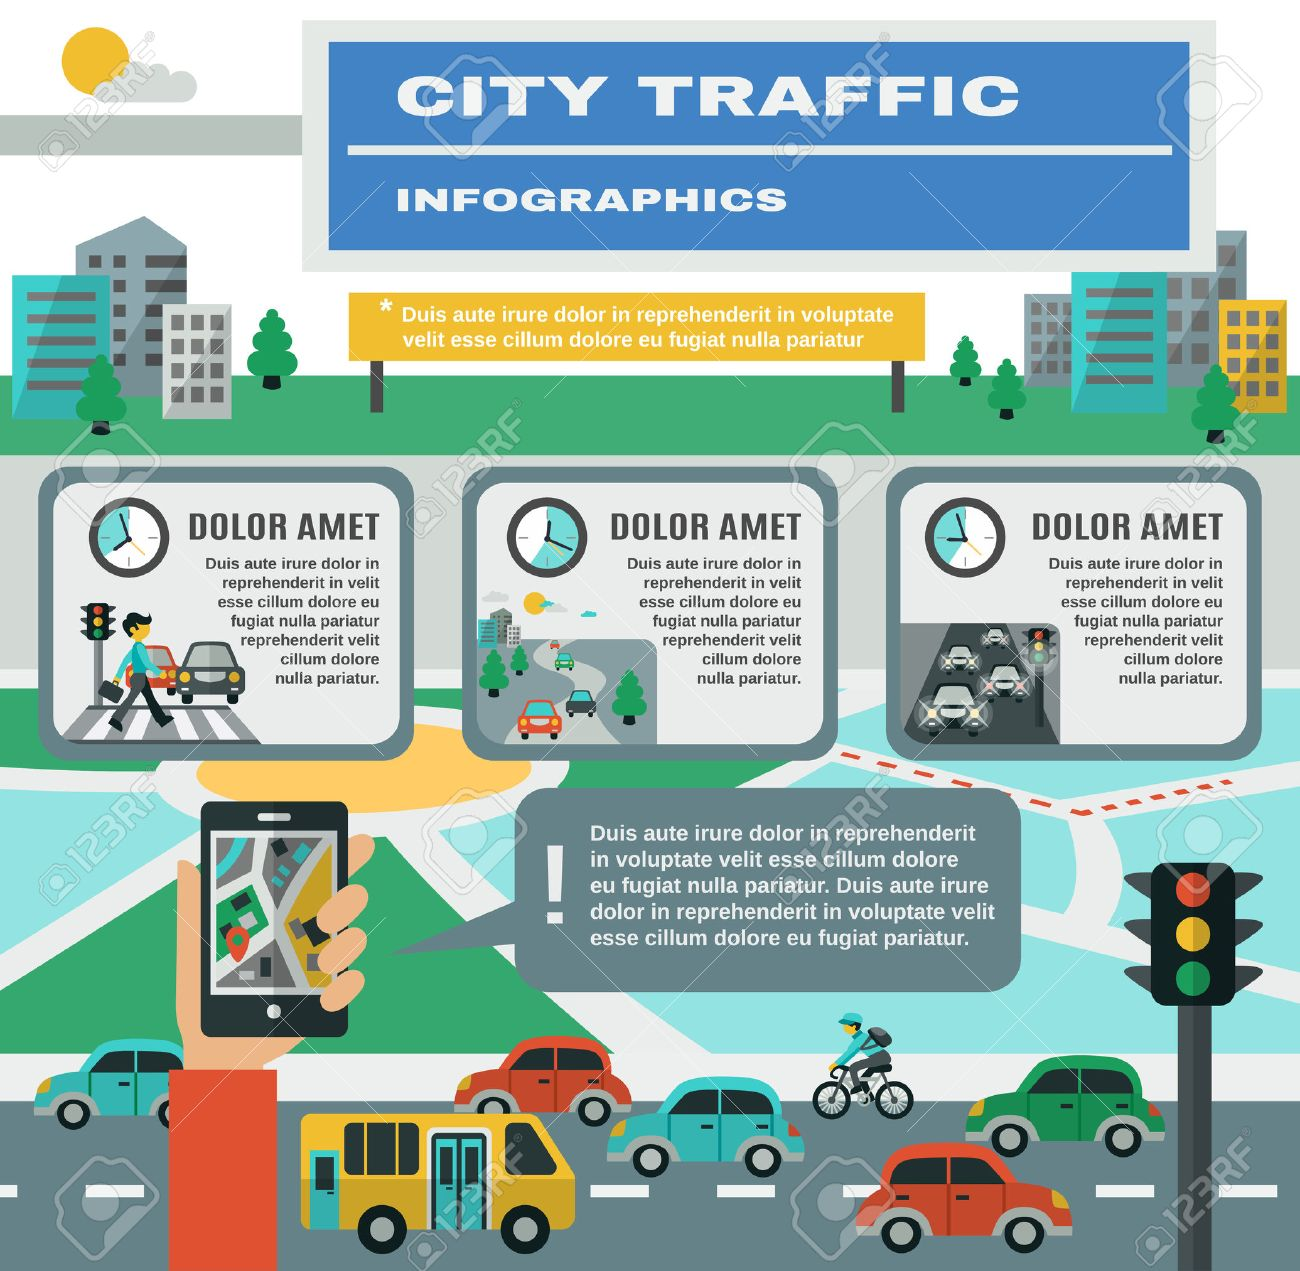 City traffic infographics set with cars gps map symbols vector city traffic infographics set with cars gps map symbols vector illustration stock vector 41534422 biocorpaavc